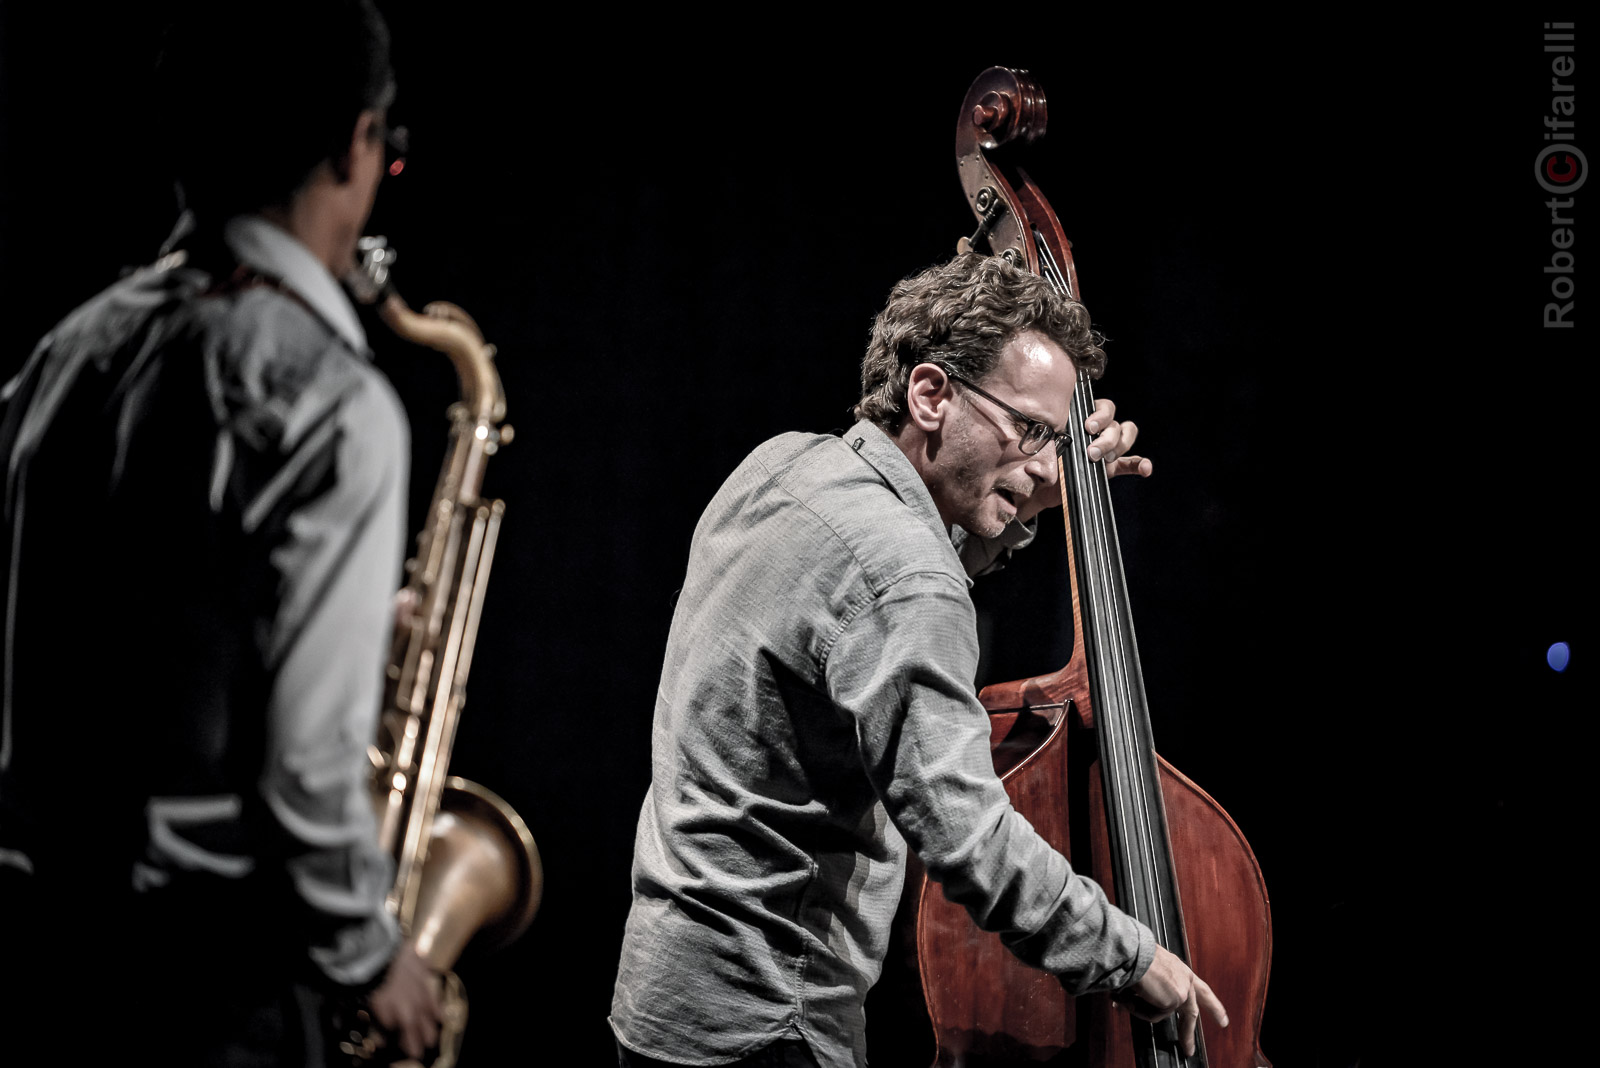 Larry Grenadier Fly Trio at Bluenote in Milan